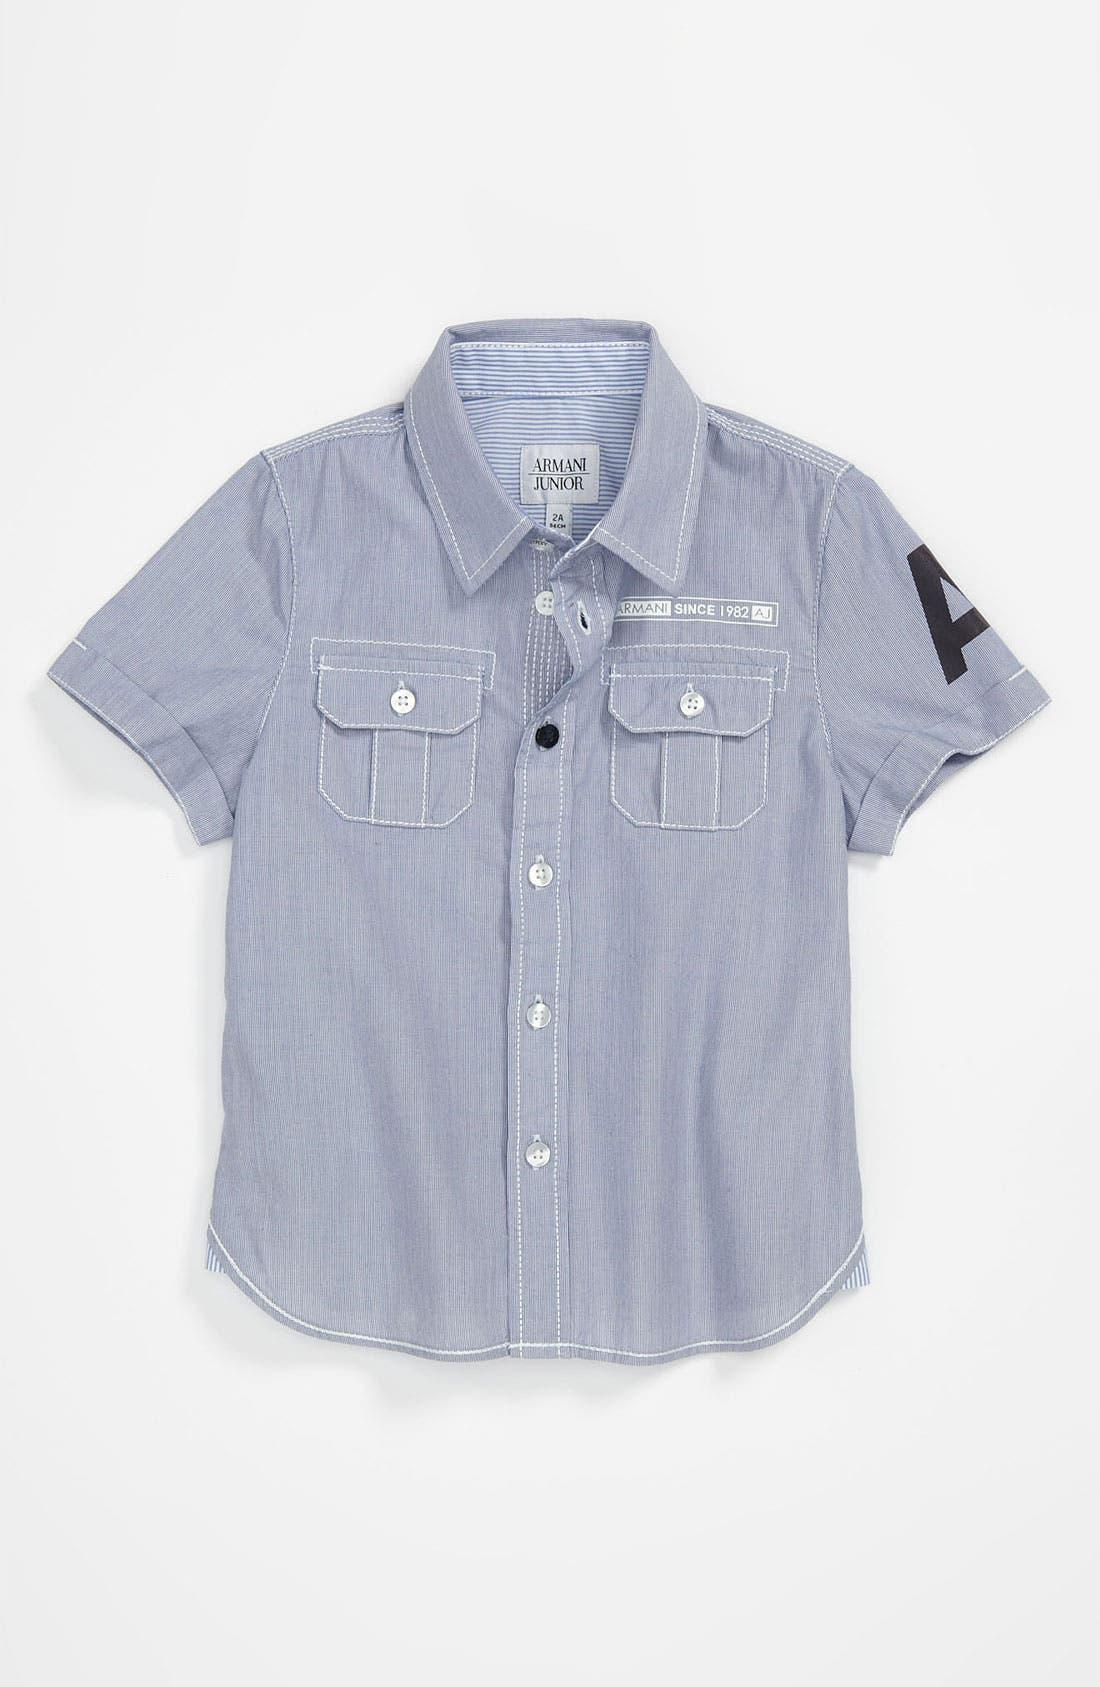 Main Image - Armani Junior Woven Shirt (Little Boys)